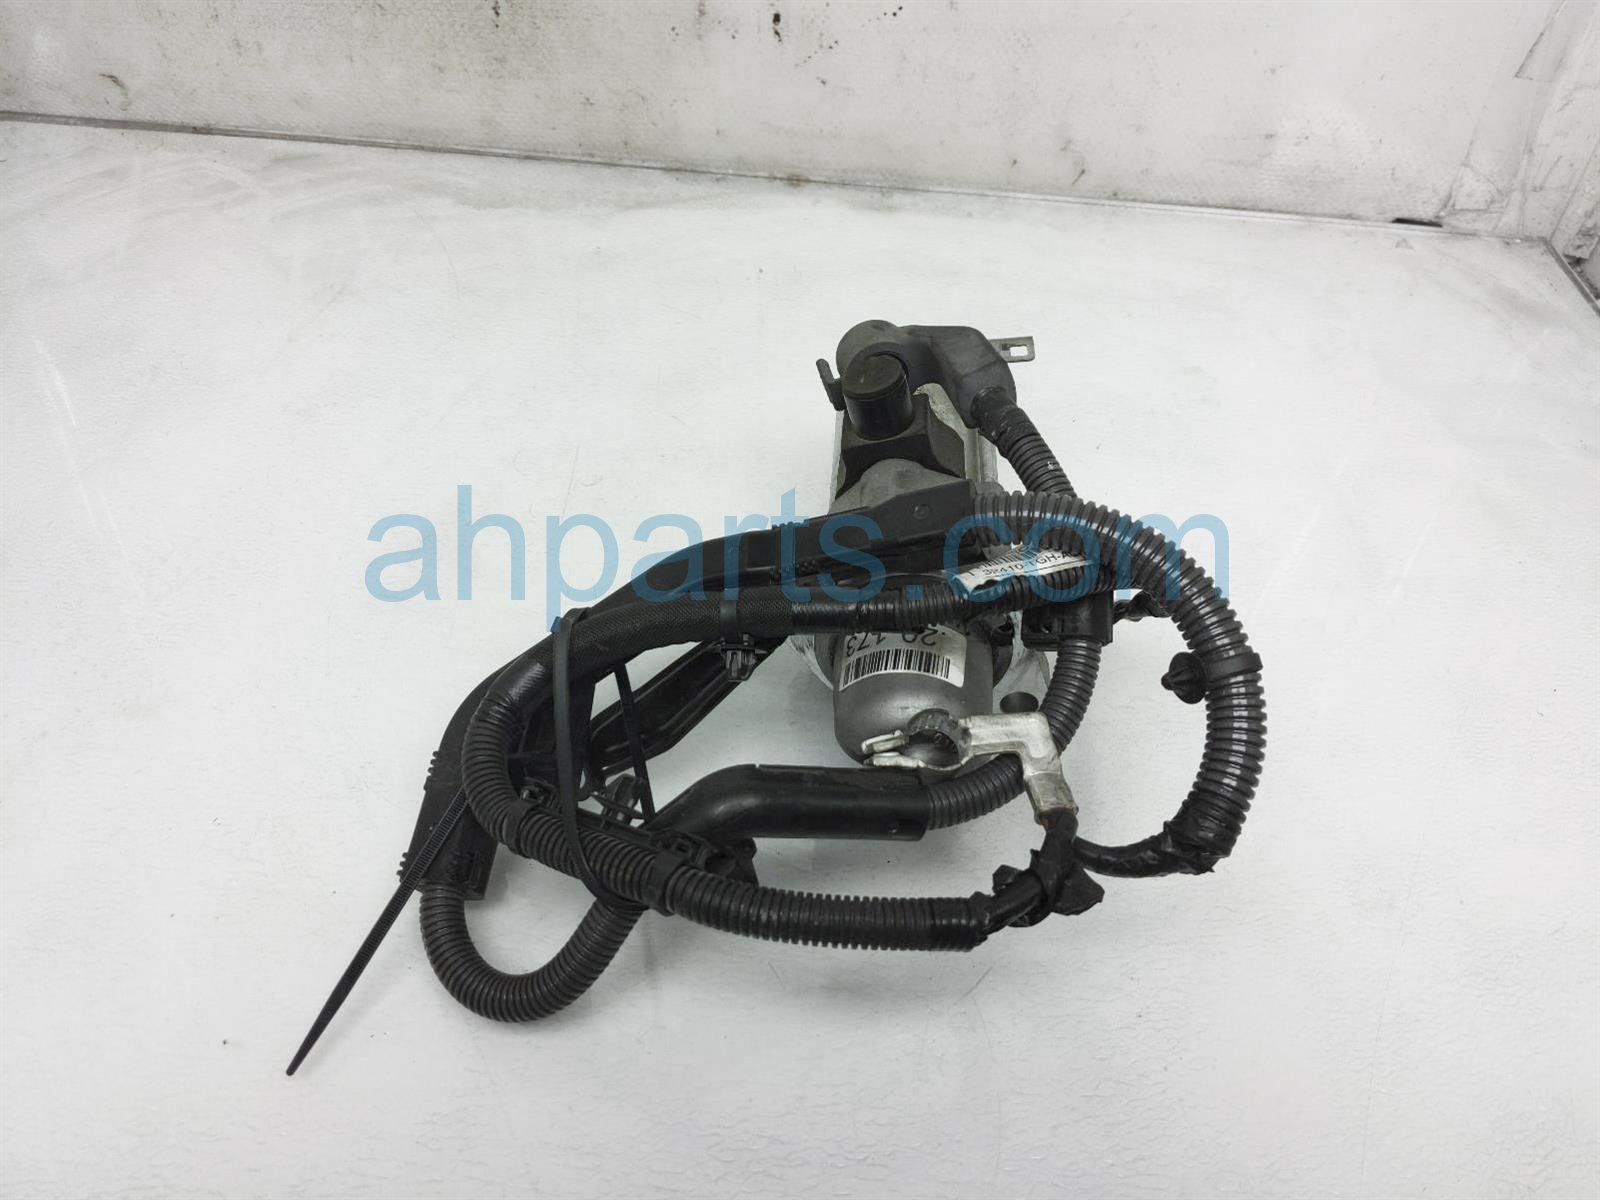 2018 Honda Civic Starter Motor Type R Fk8 31200 RPY G02 Replacement